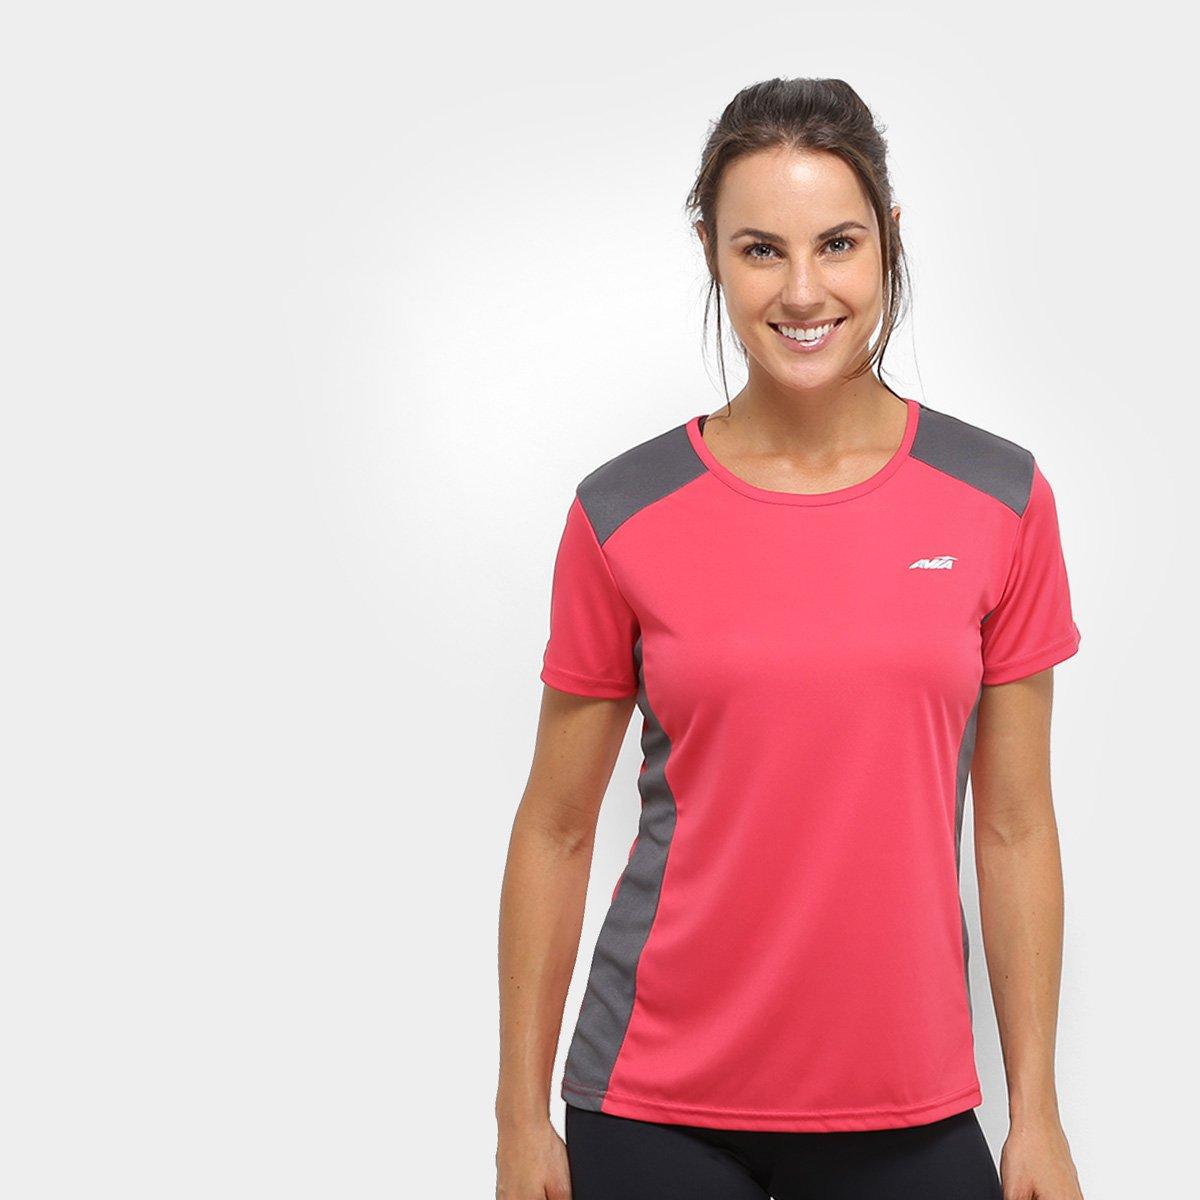 Camiseta Avia Leeds Feminina 4f6b36f092792